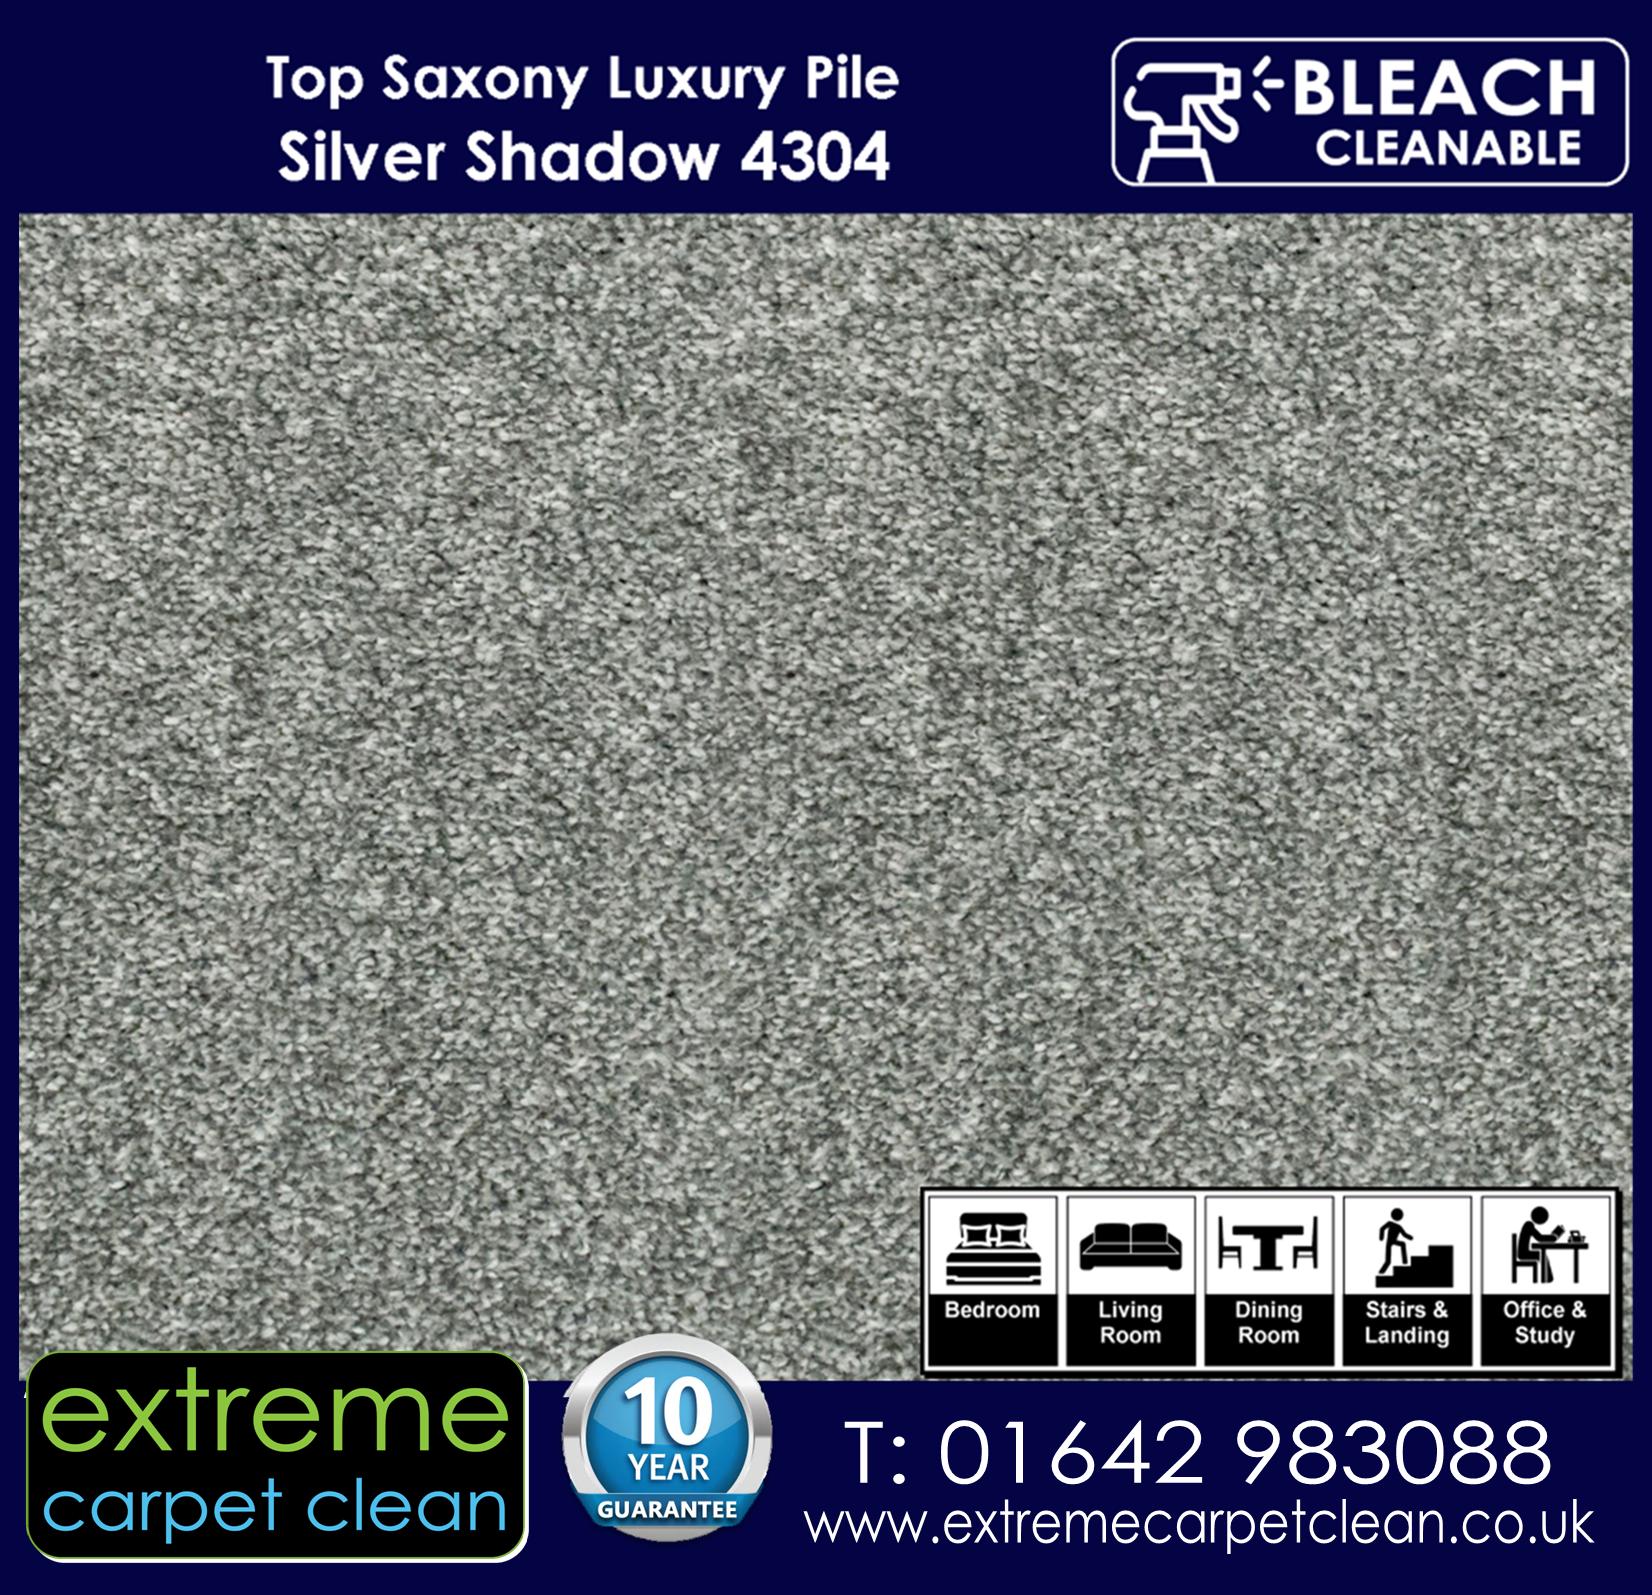 Extreme Carpet Clean Top Saxony Silver Shadow  Carpet 4304